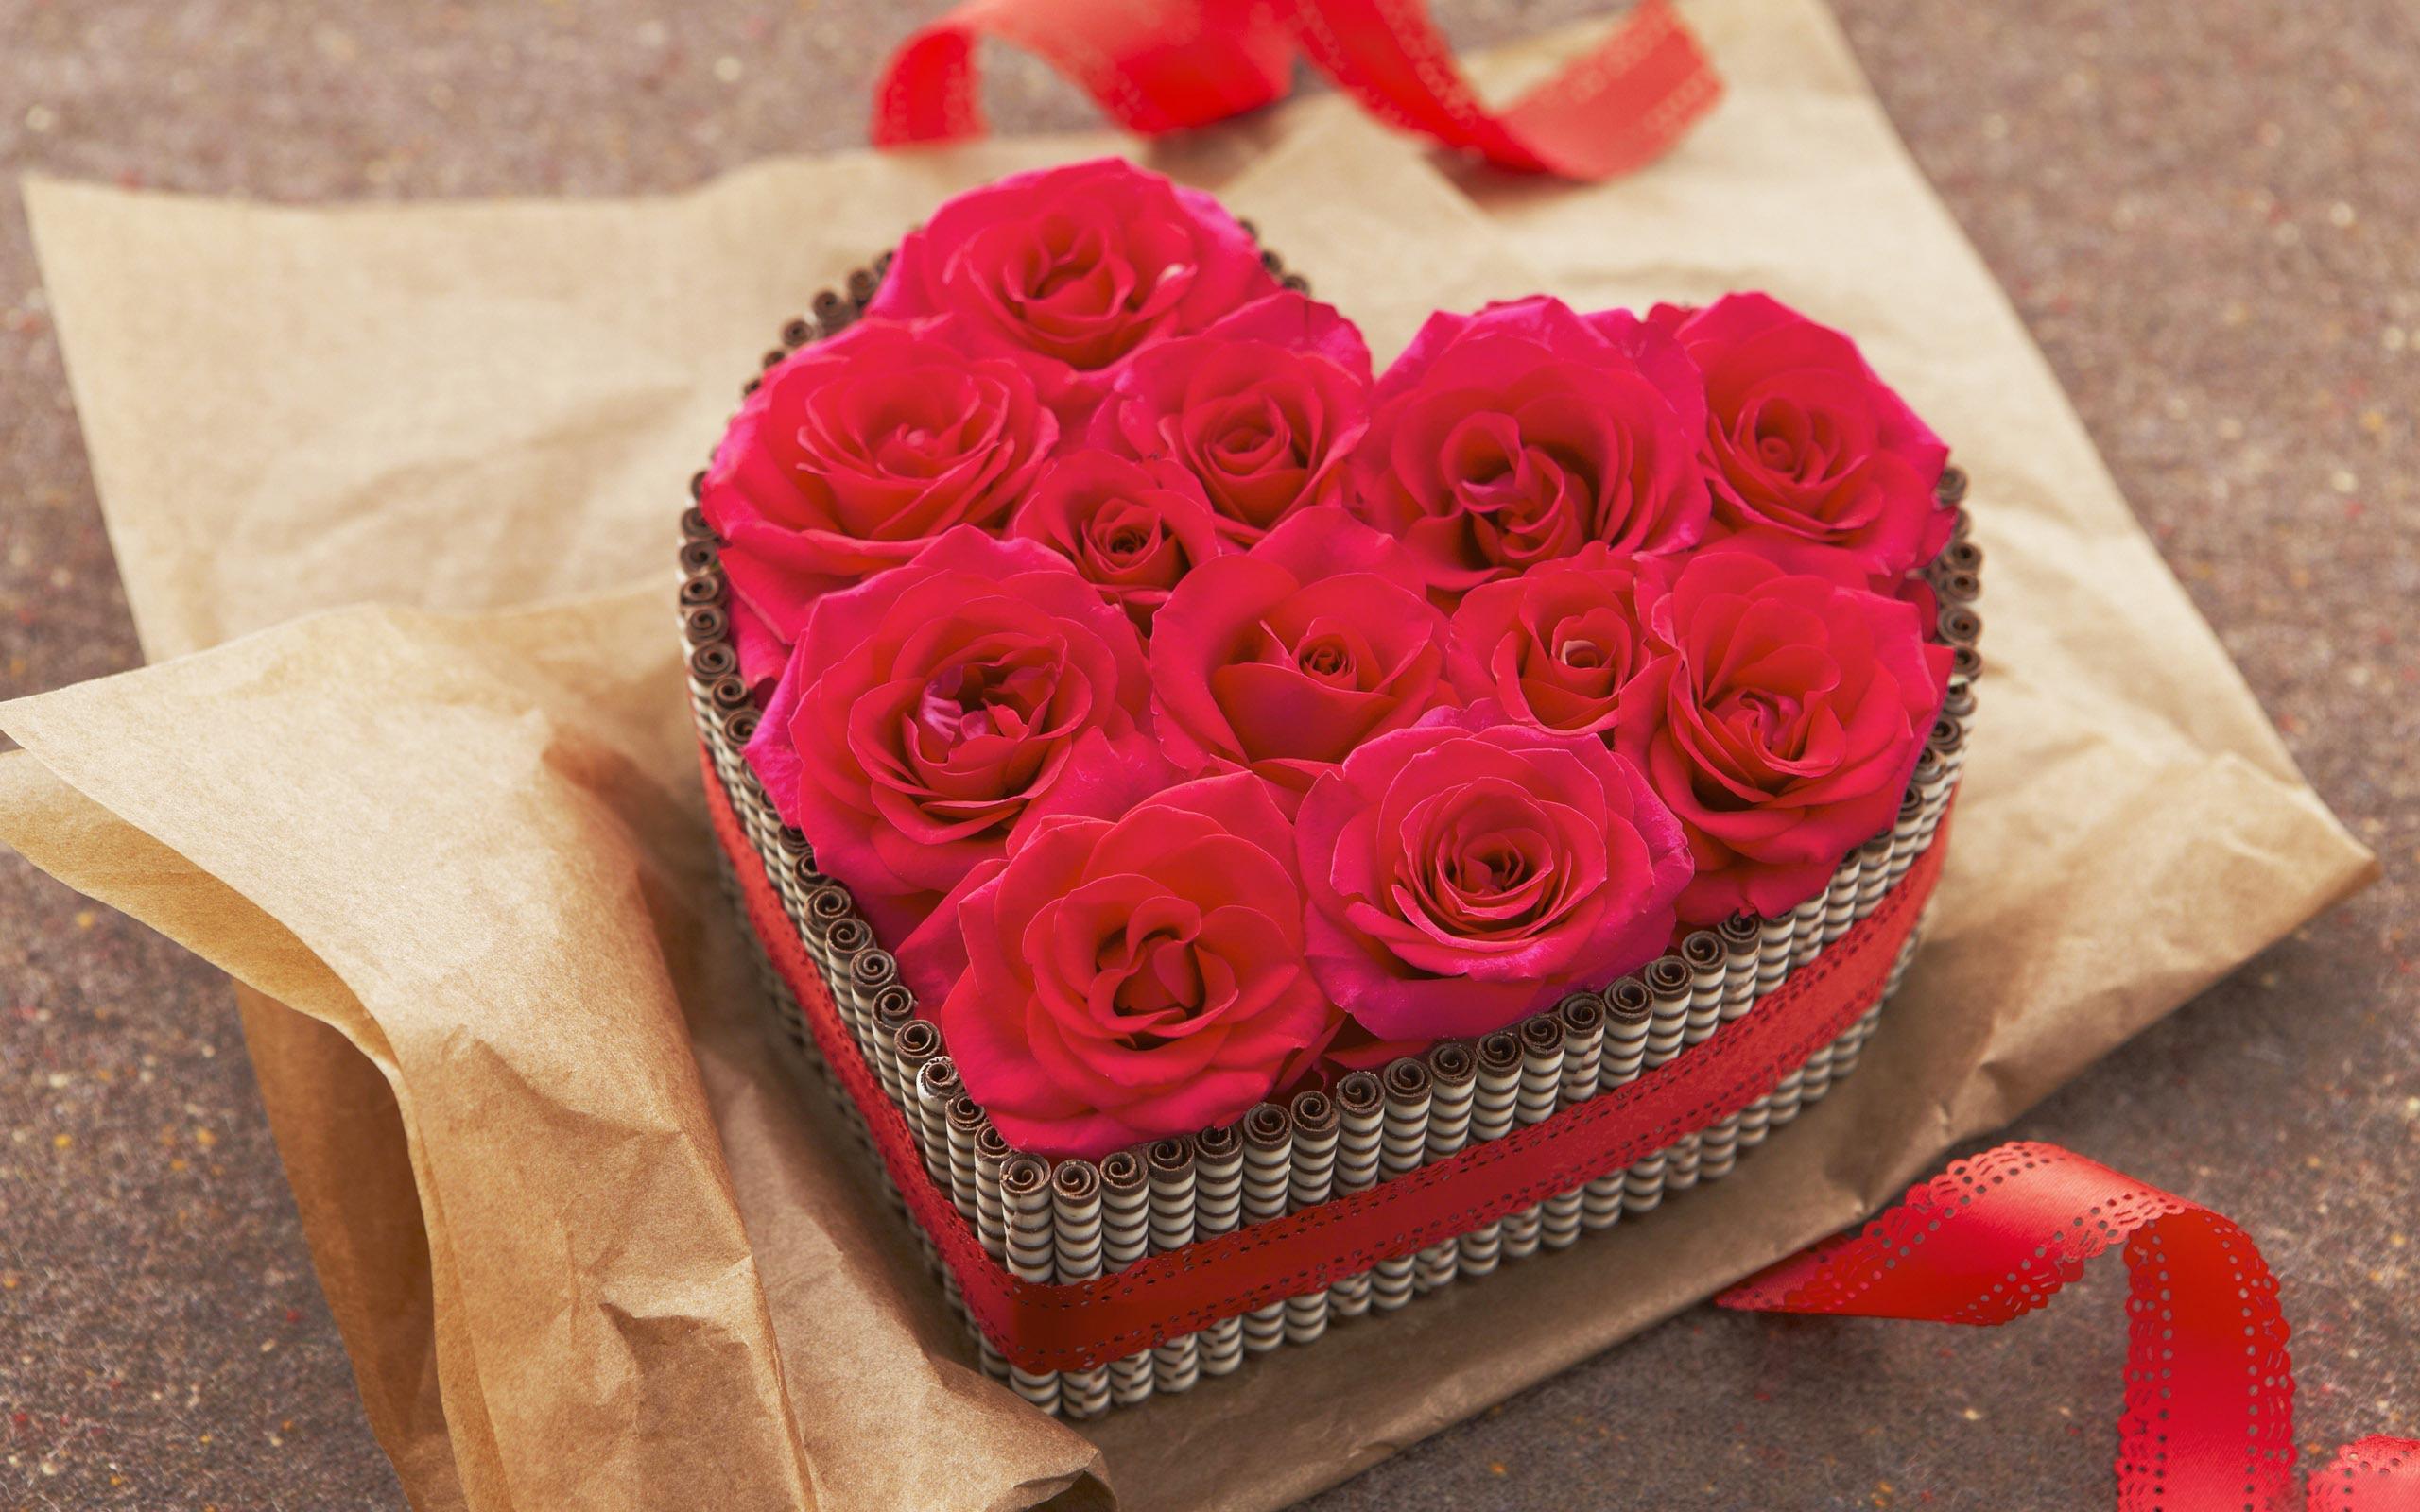 Подарок на 14 февраля своими руками для девушки